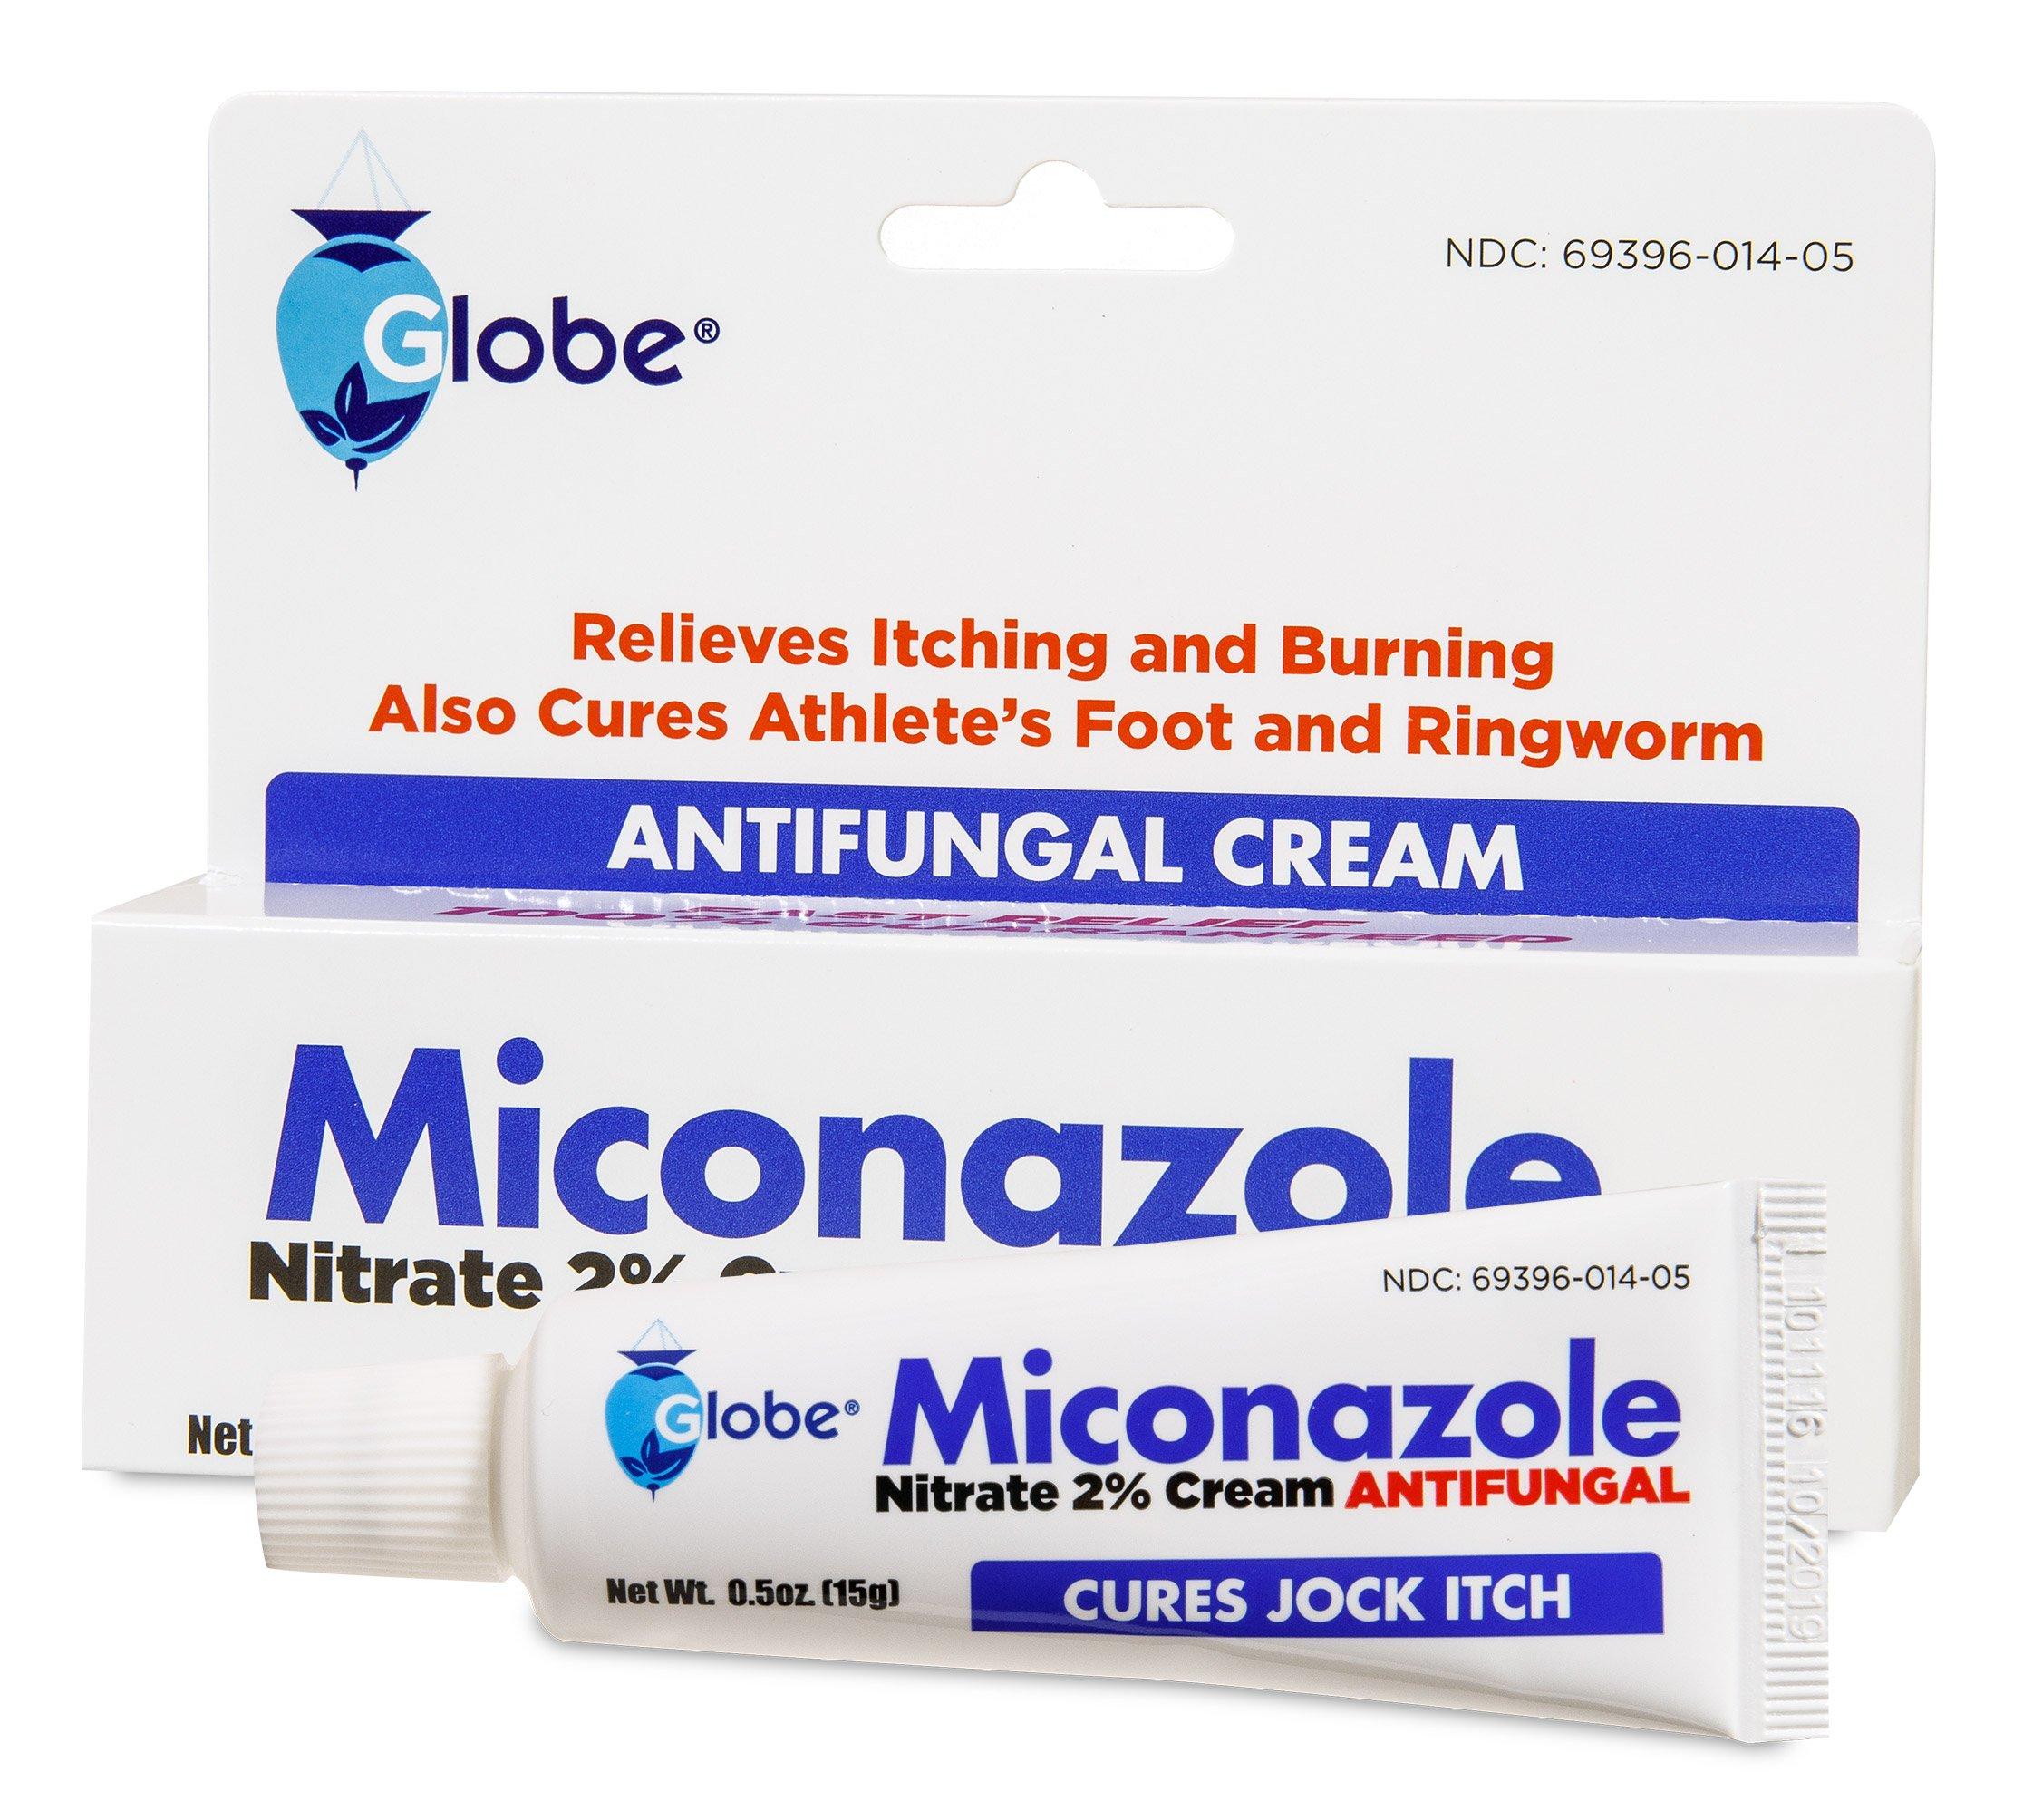 Miconazole Nitrate 2 % Antifungal Cream - 0.5 Oz